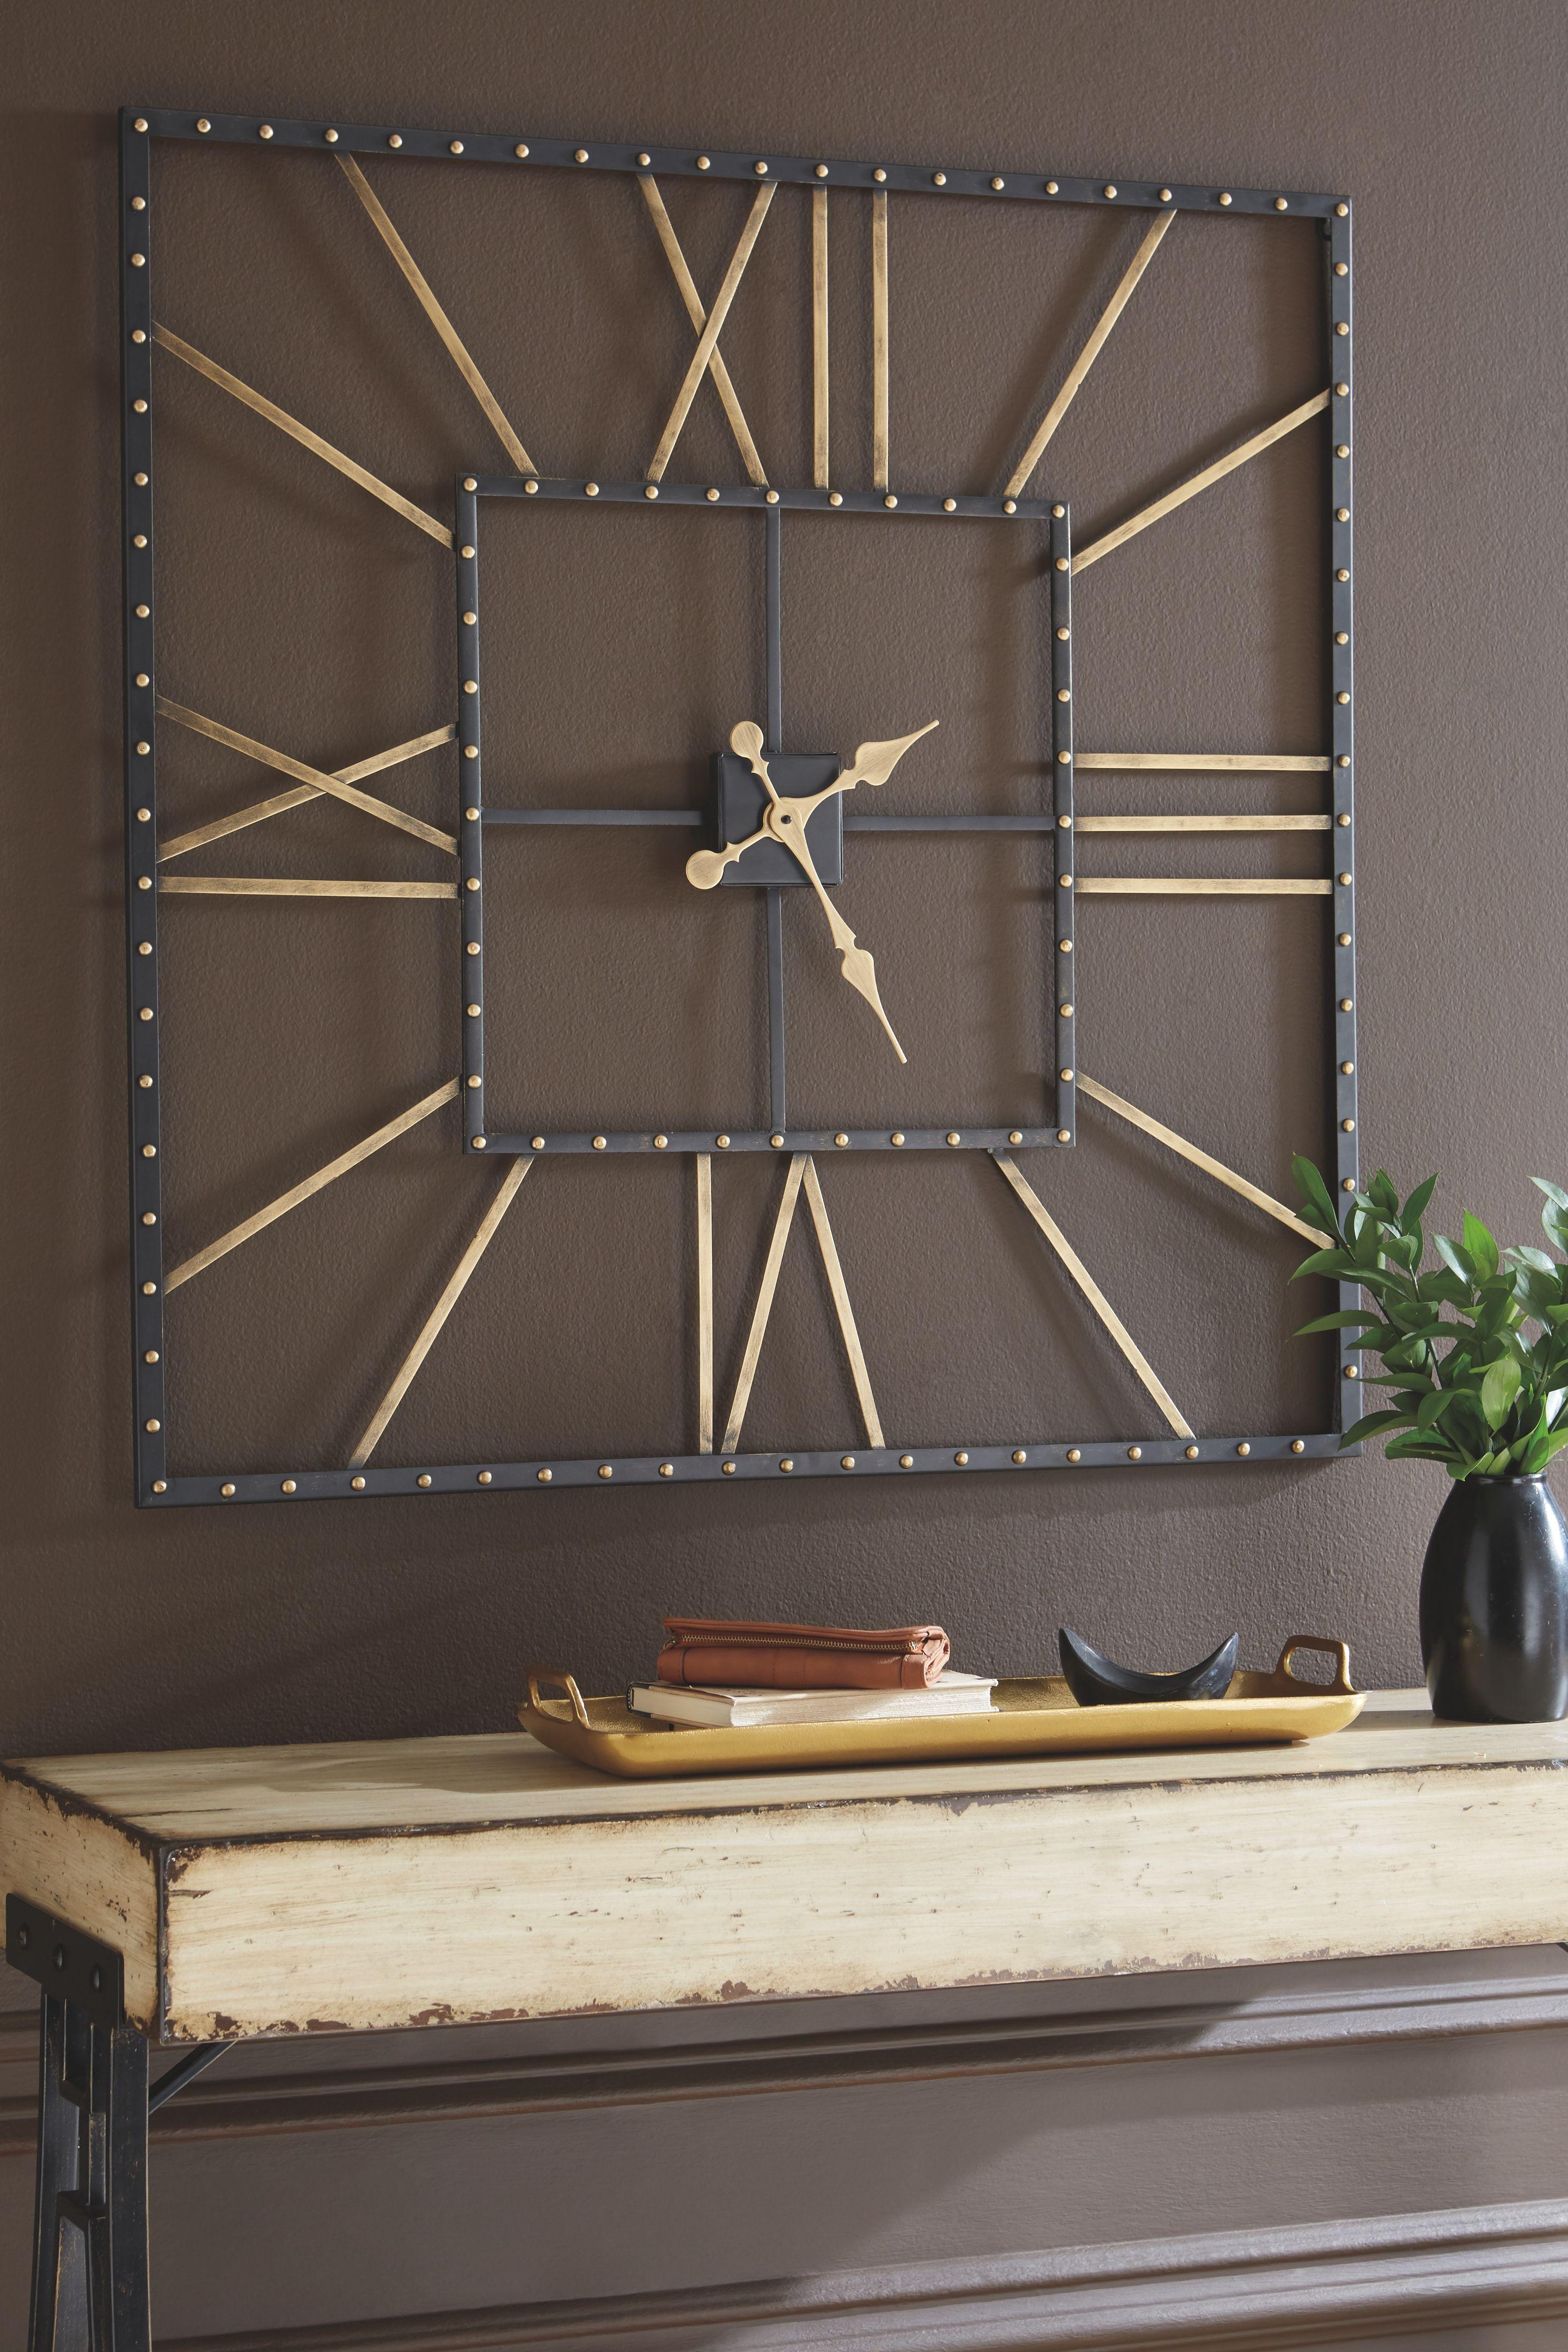 Thames Wall Clock Black Gold Finish Big Wall Clocks Clock Decor